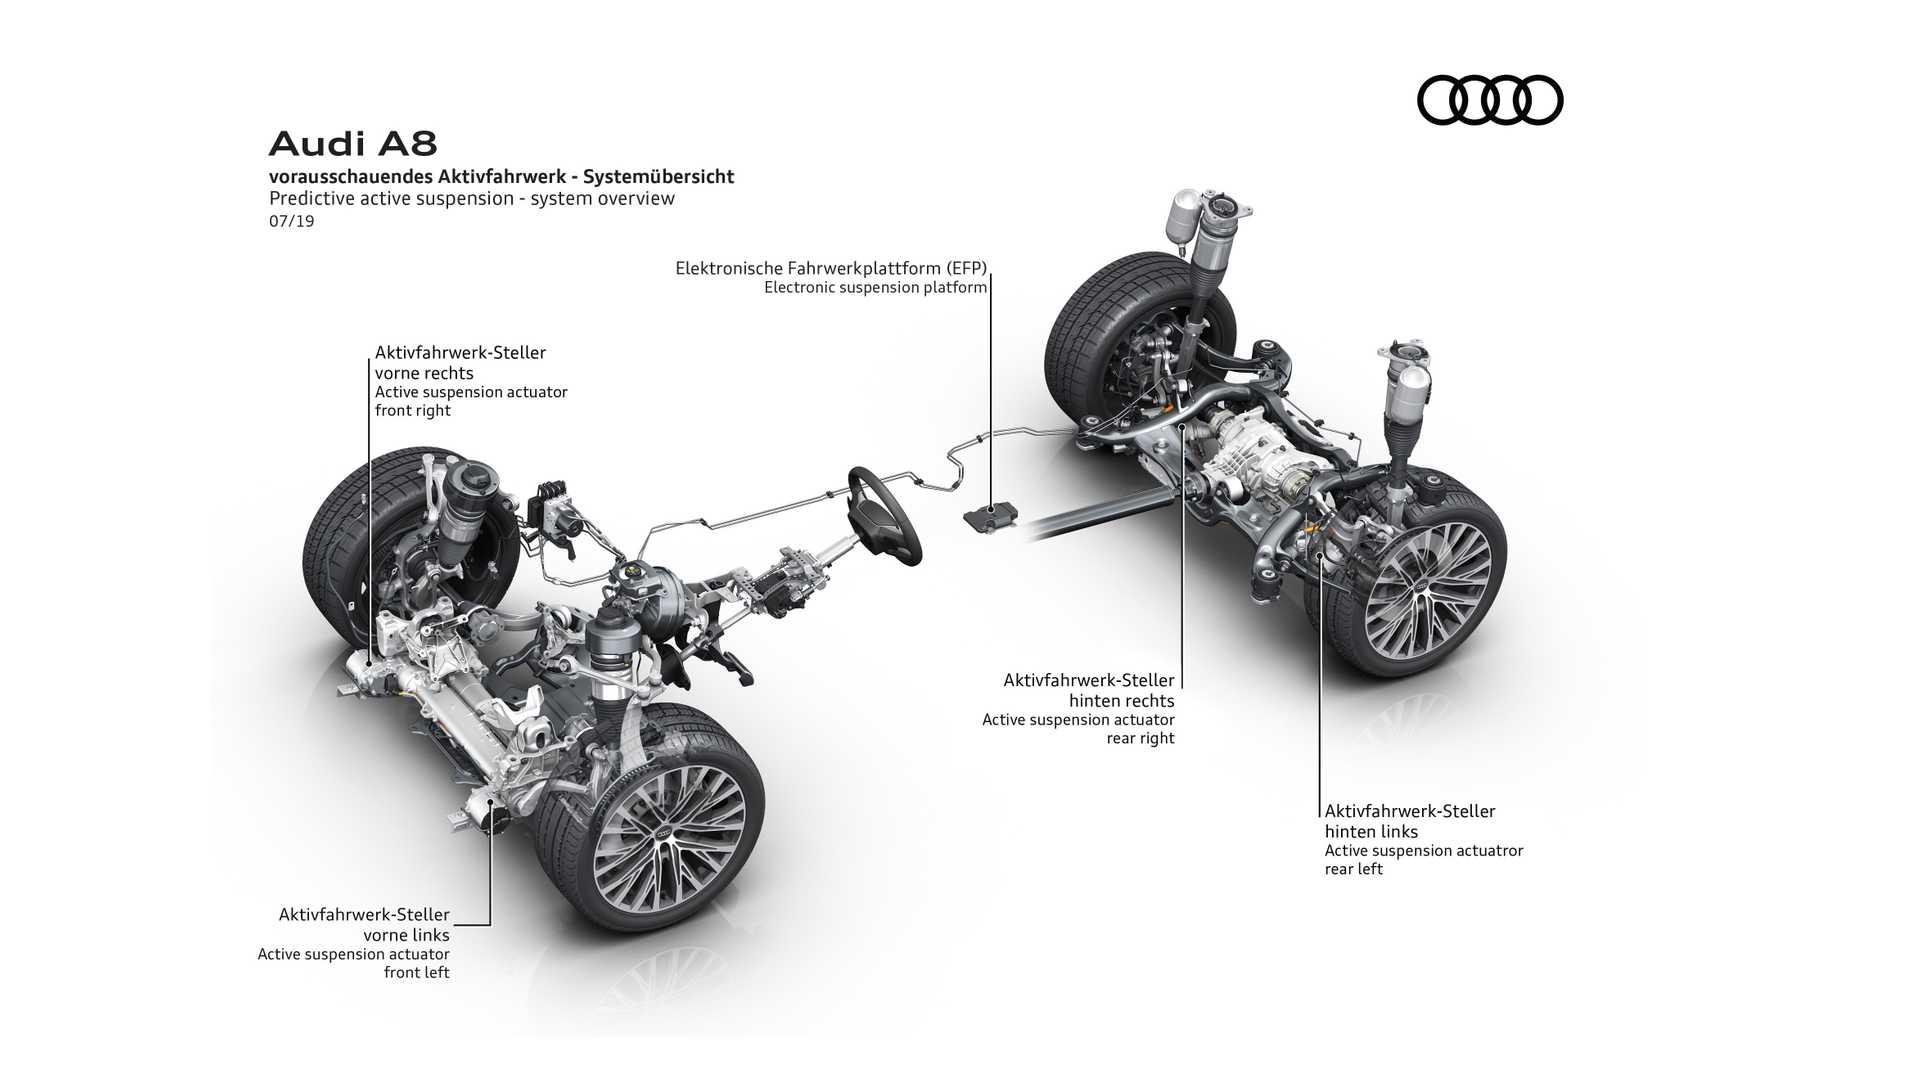 Audi-A8-with-predictive-active-suspension-3